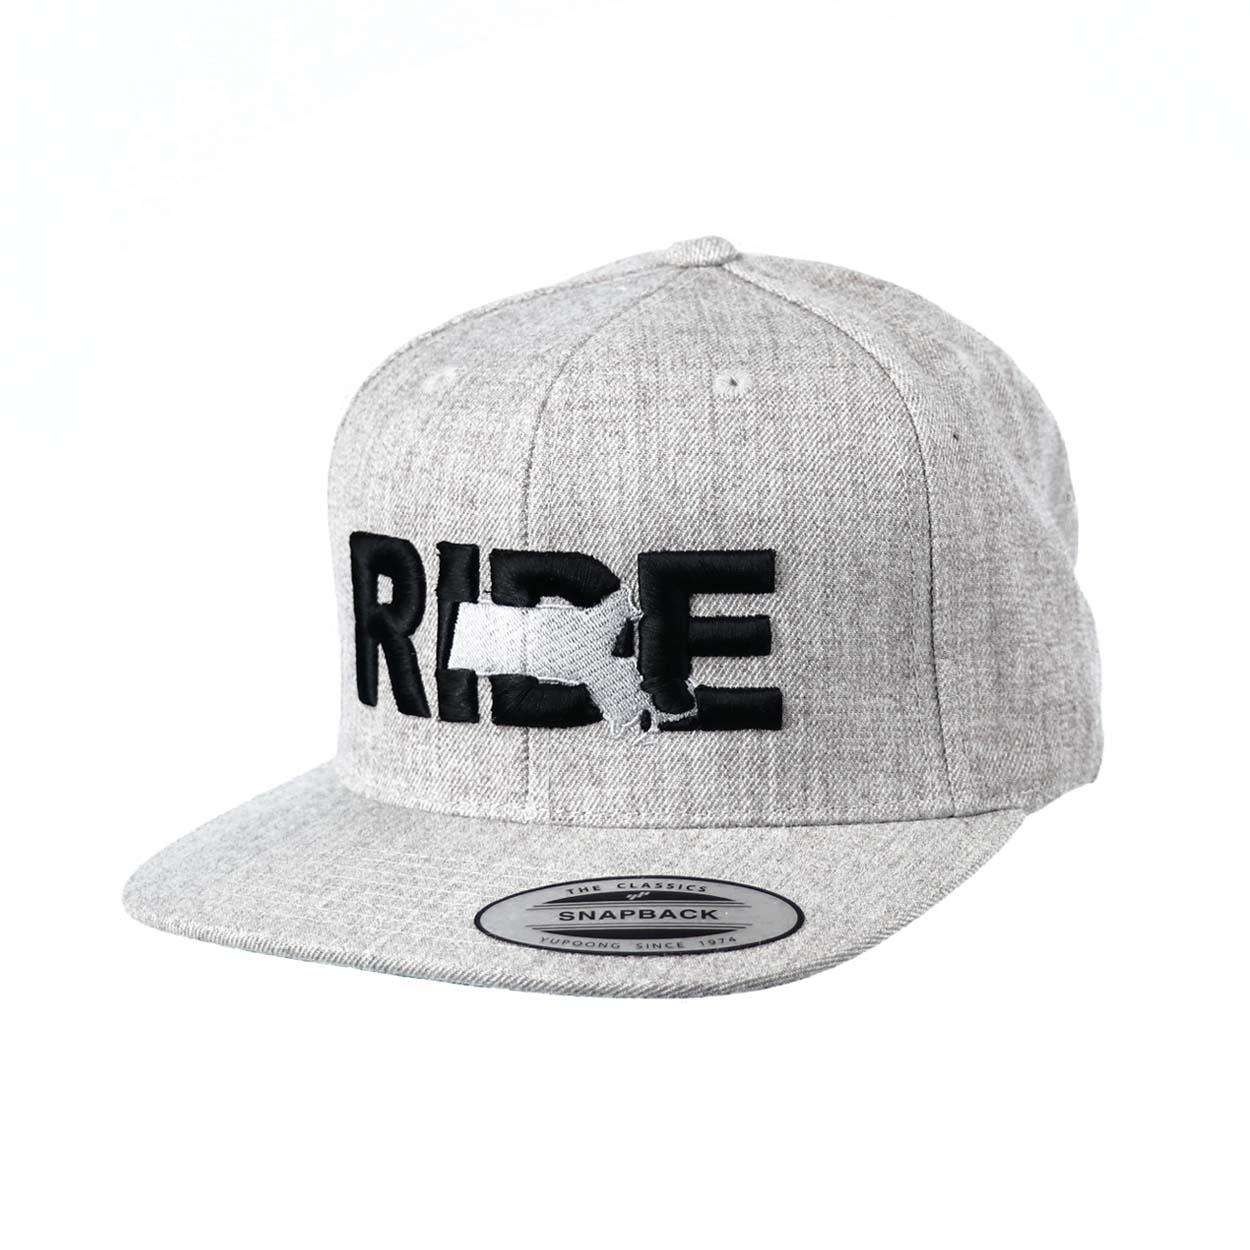 Ride Massachusetts Classic Embroidered Snapback Flat Brim Hat Gray/Black